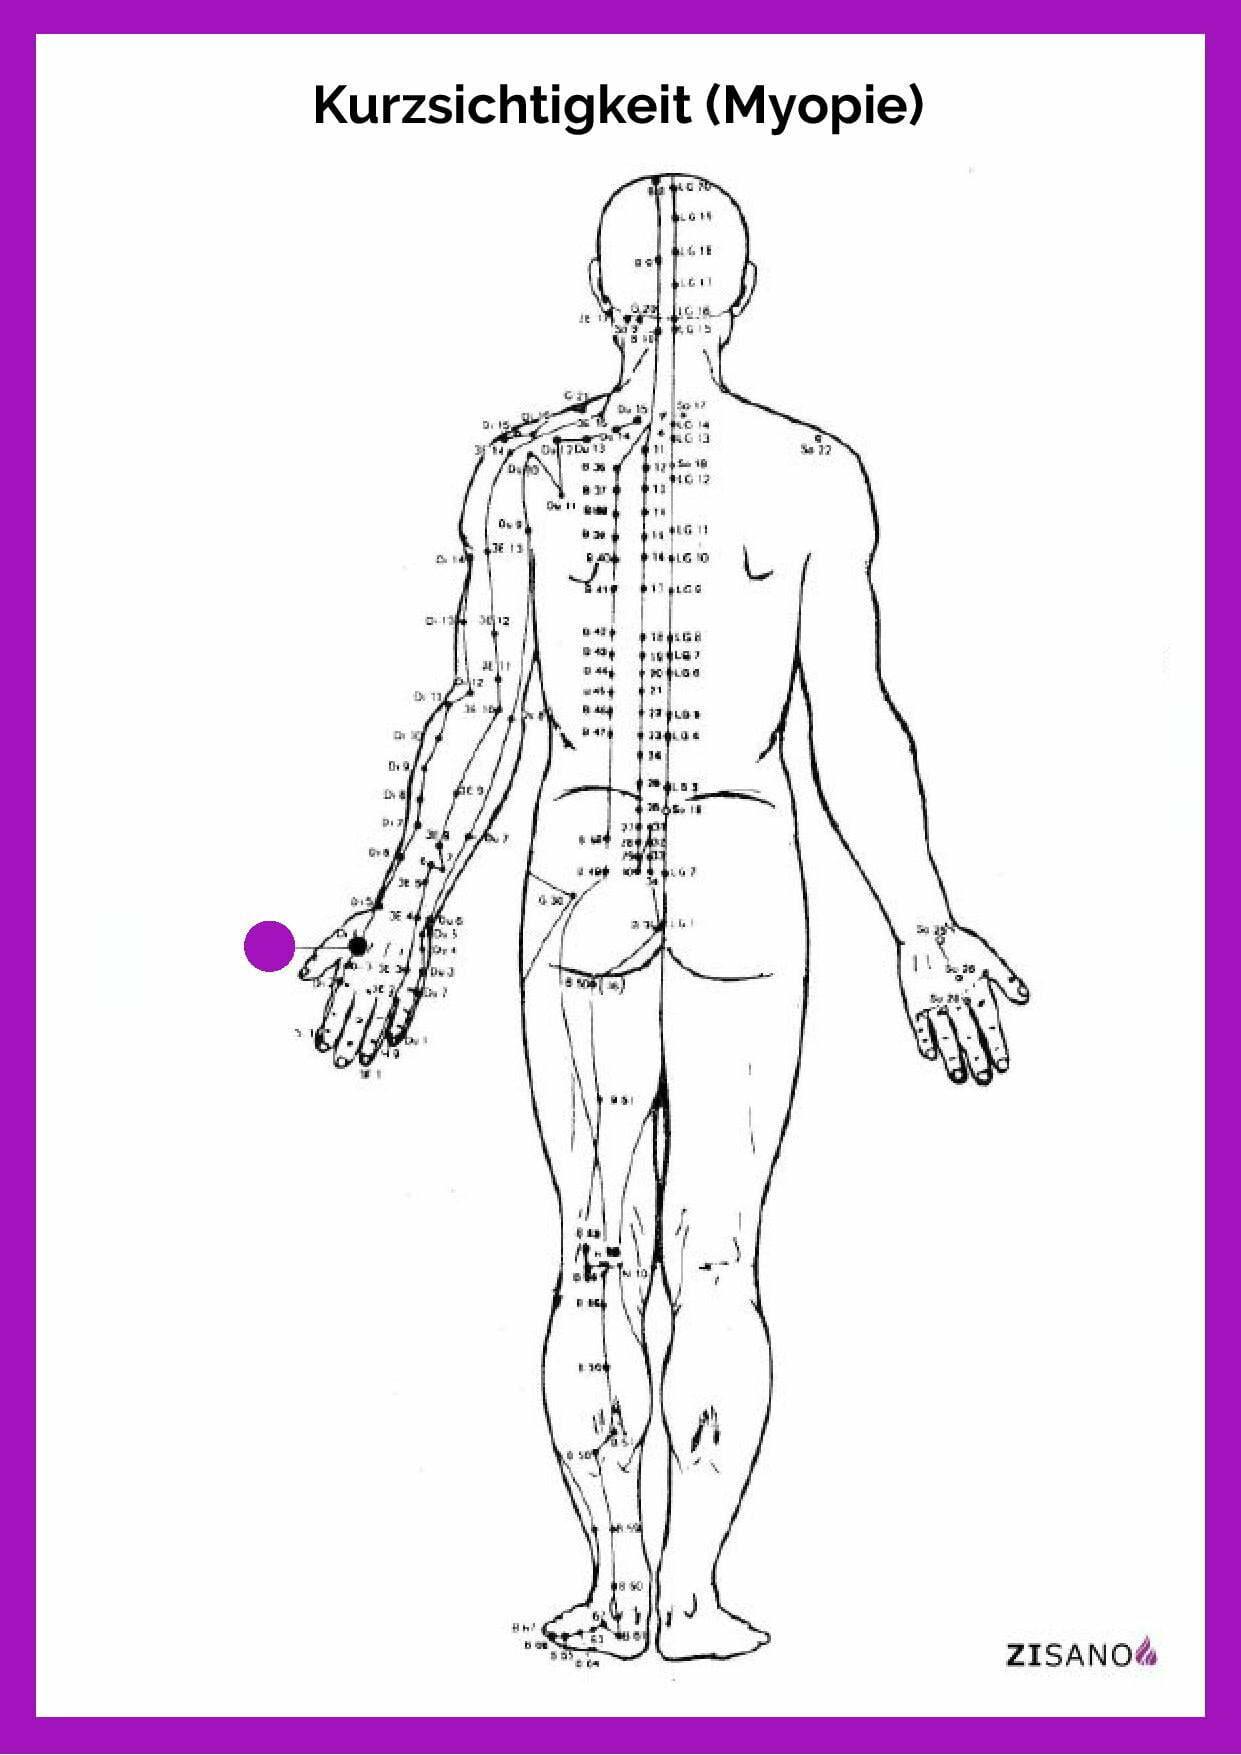 Meridiane - Kurzsichtigkeit - Myopie - Beschwerden